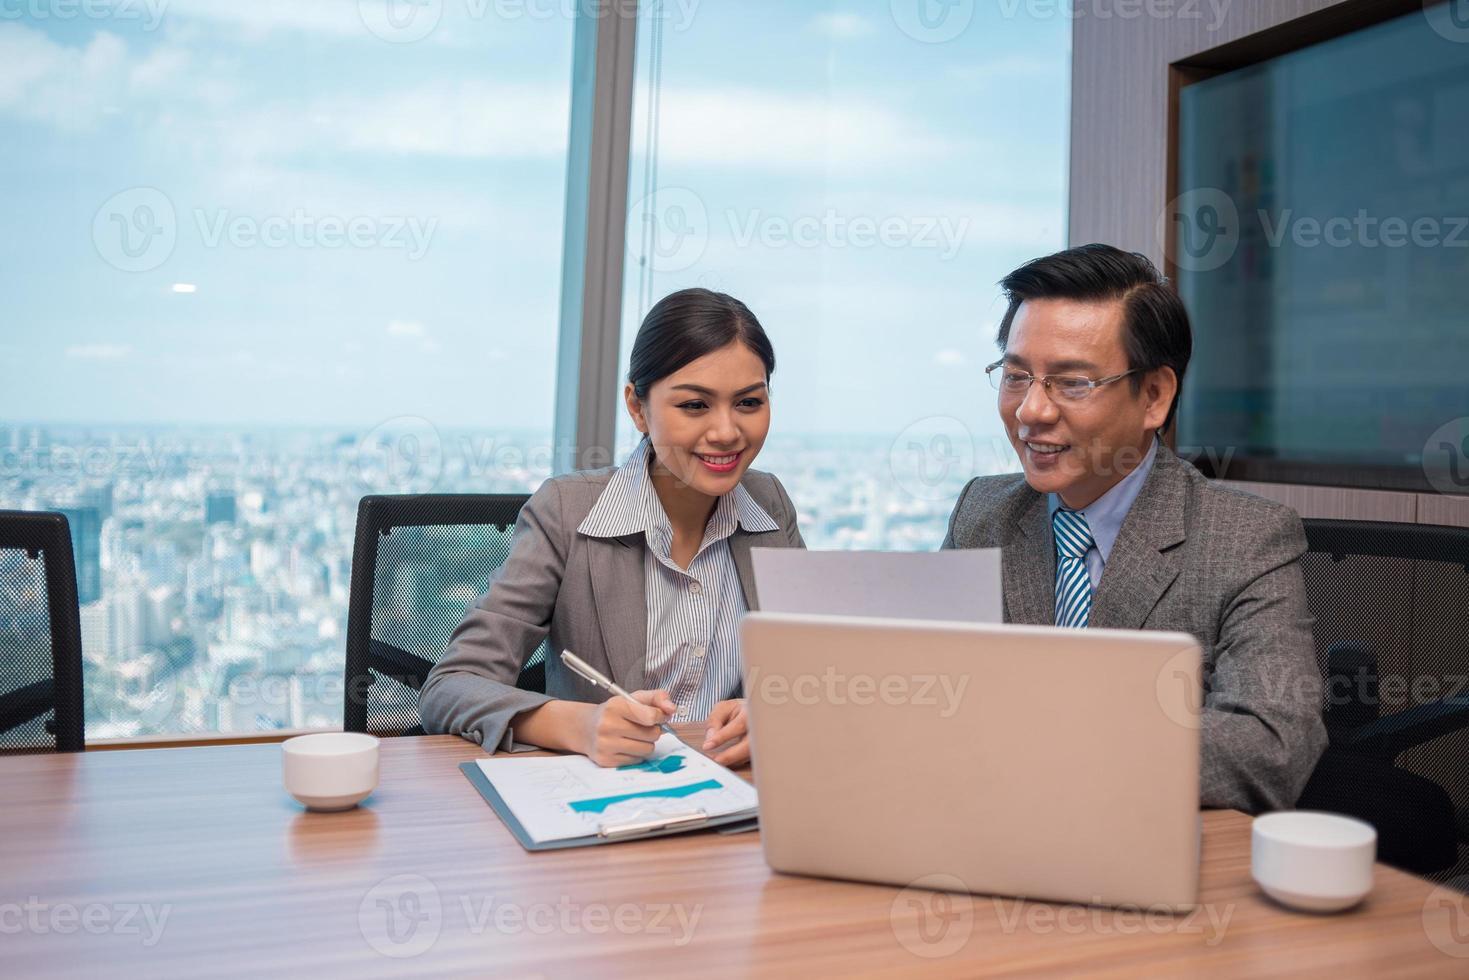 analys av finansiella dokument foto